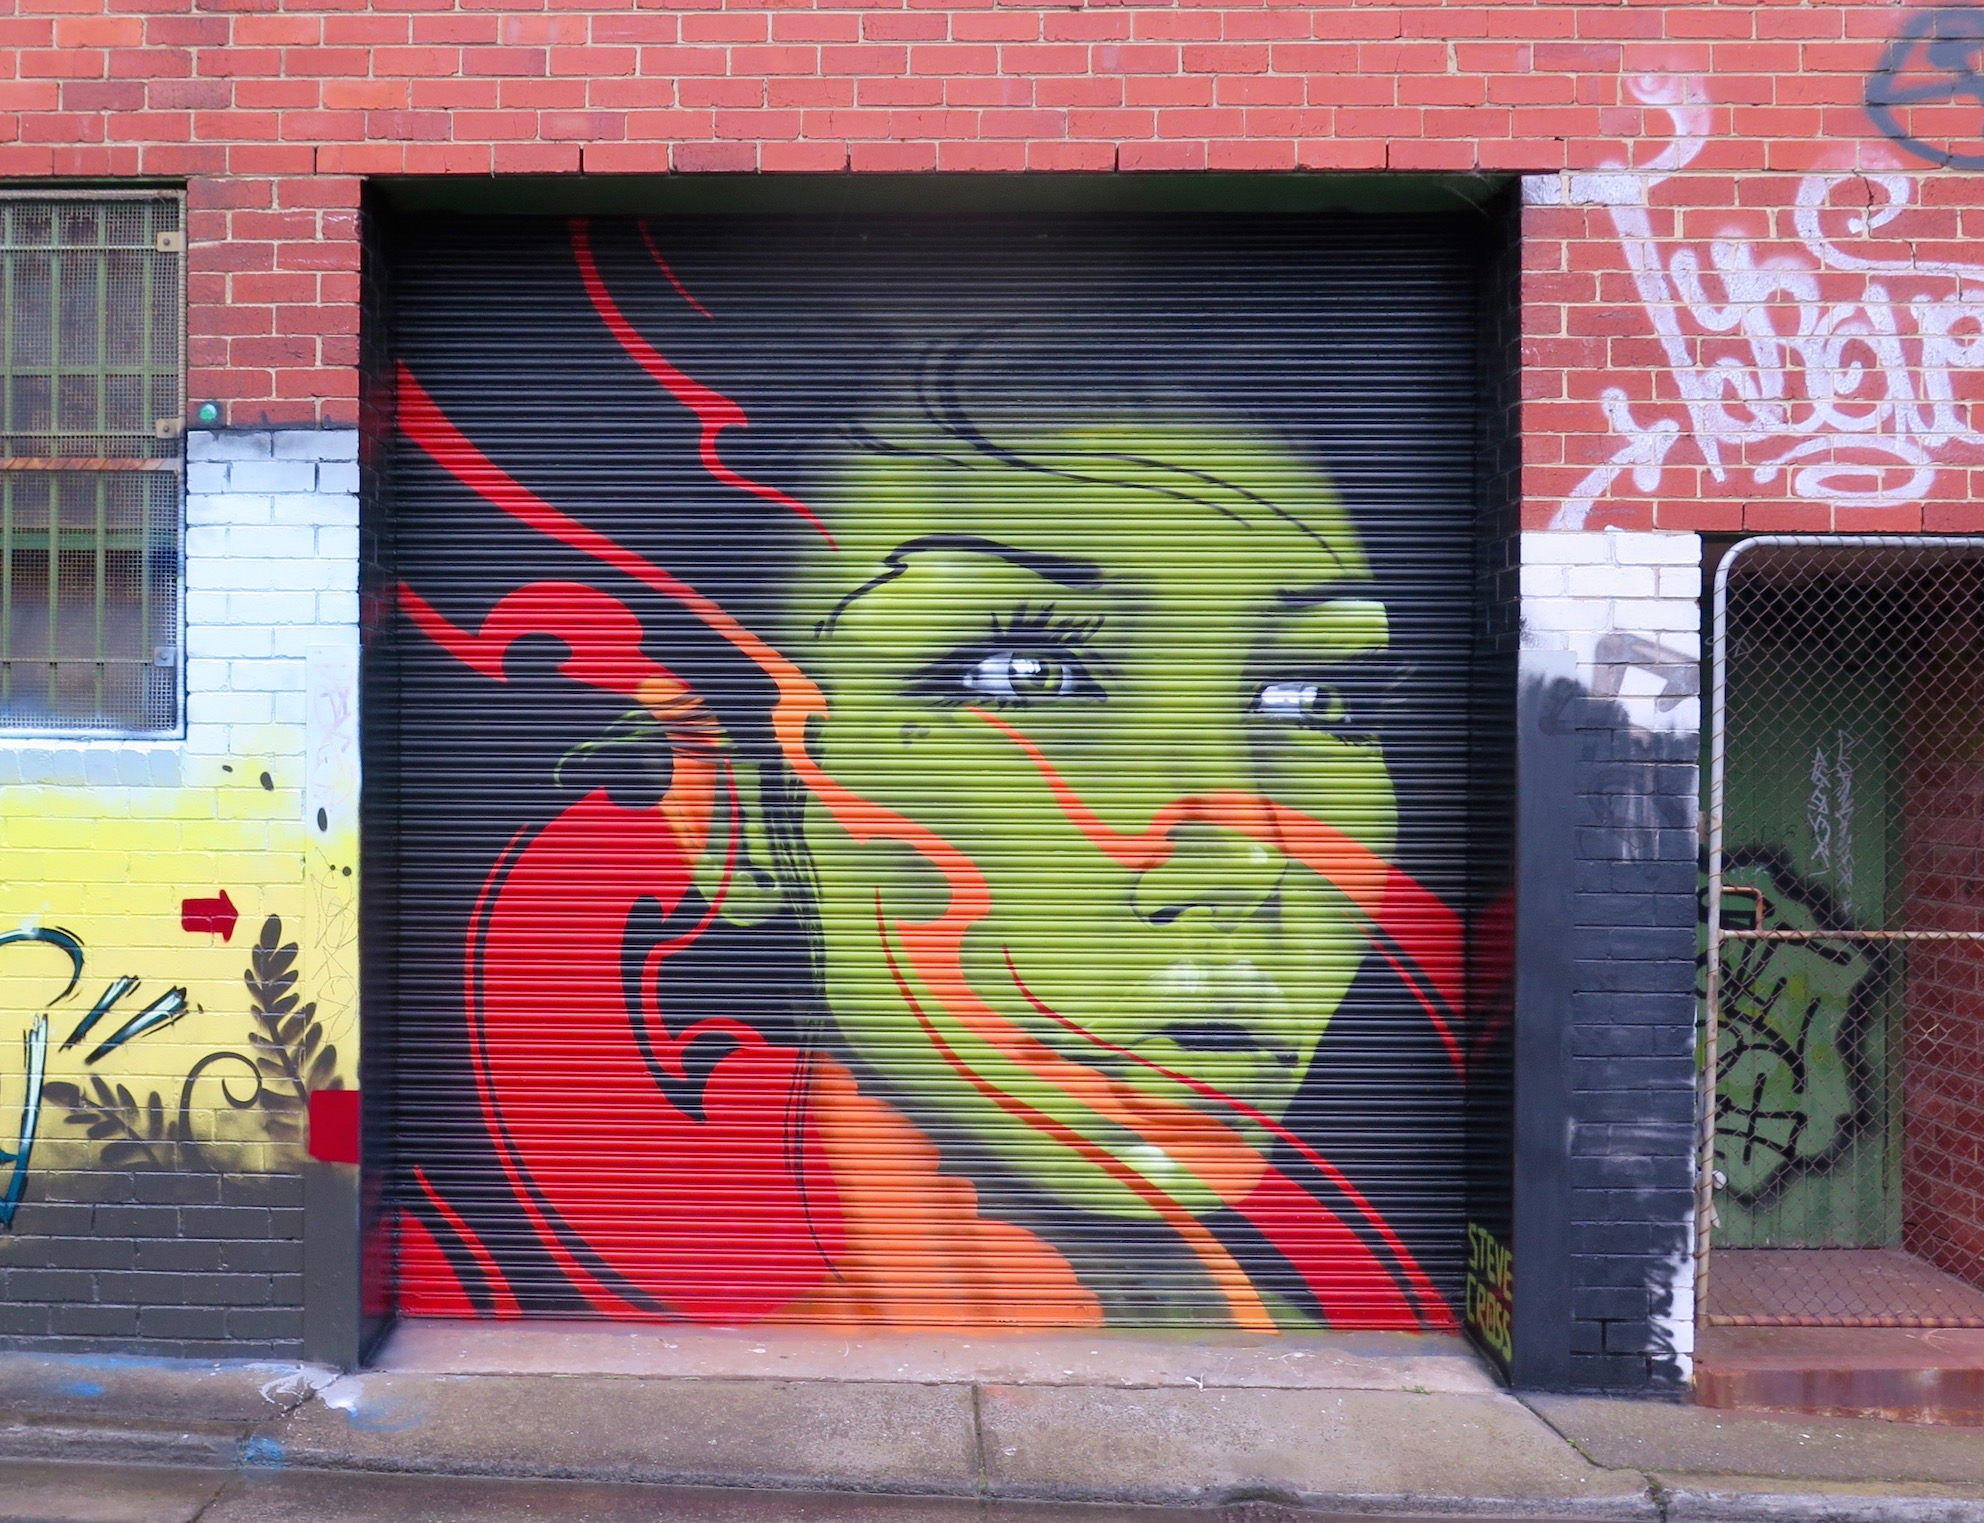 deansunshine_landofsunshine_melbourne_streetart_graffiti_invurt-top-ten-66-4-steve-cross-4